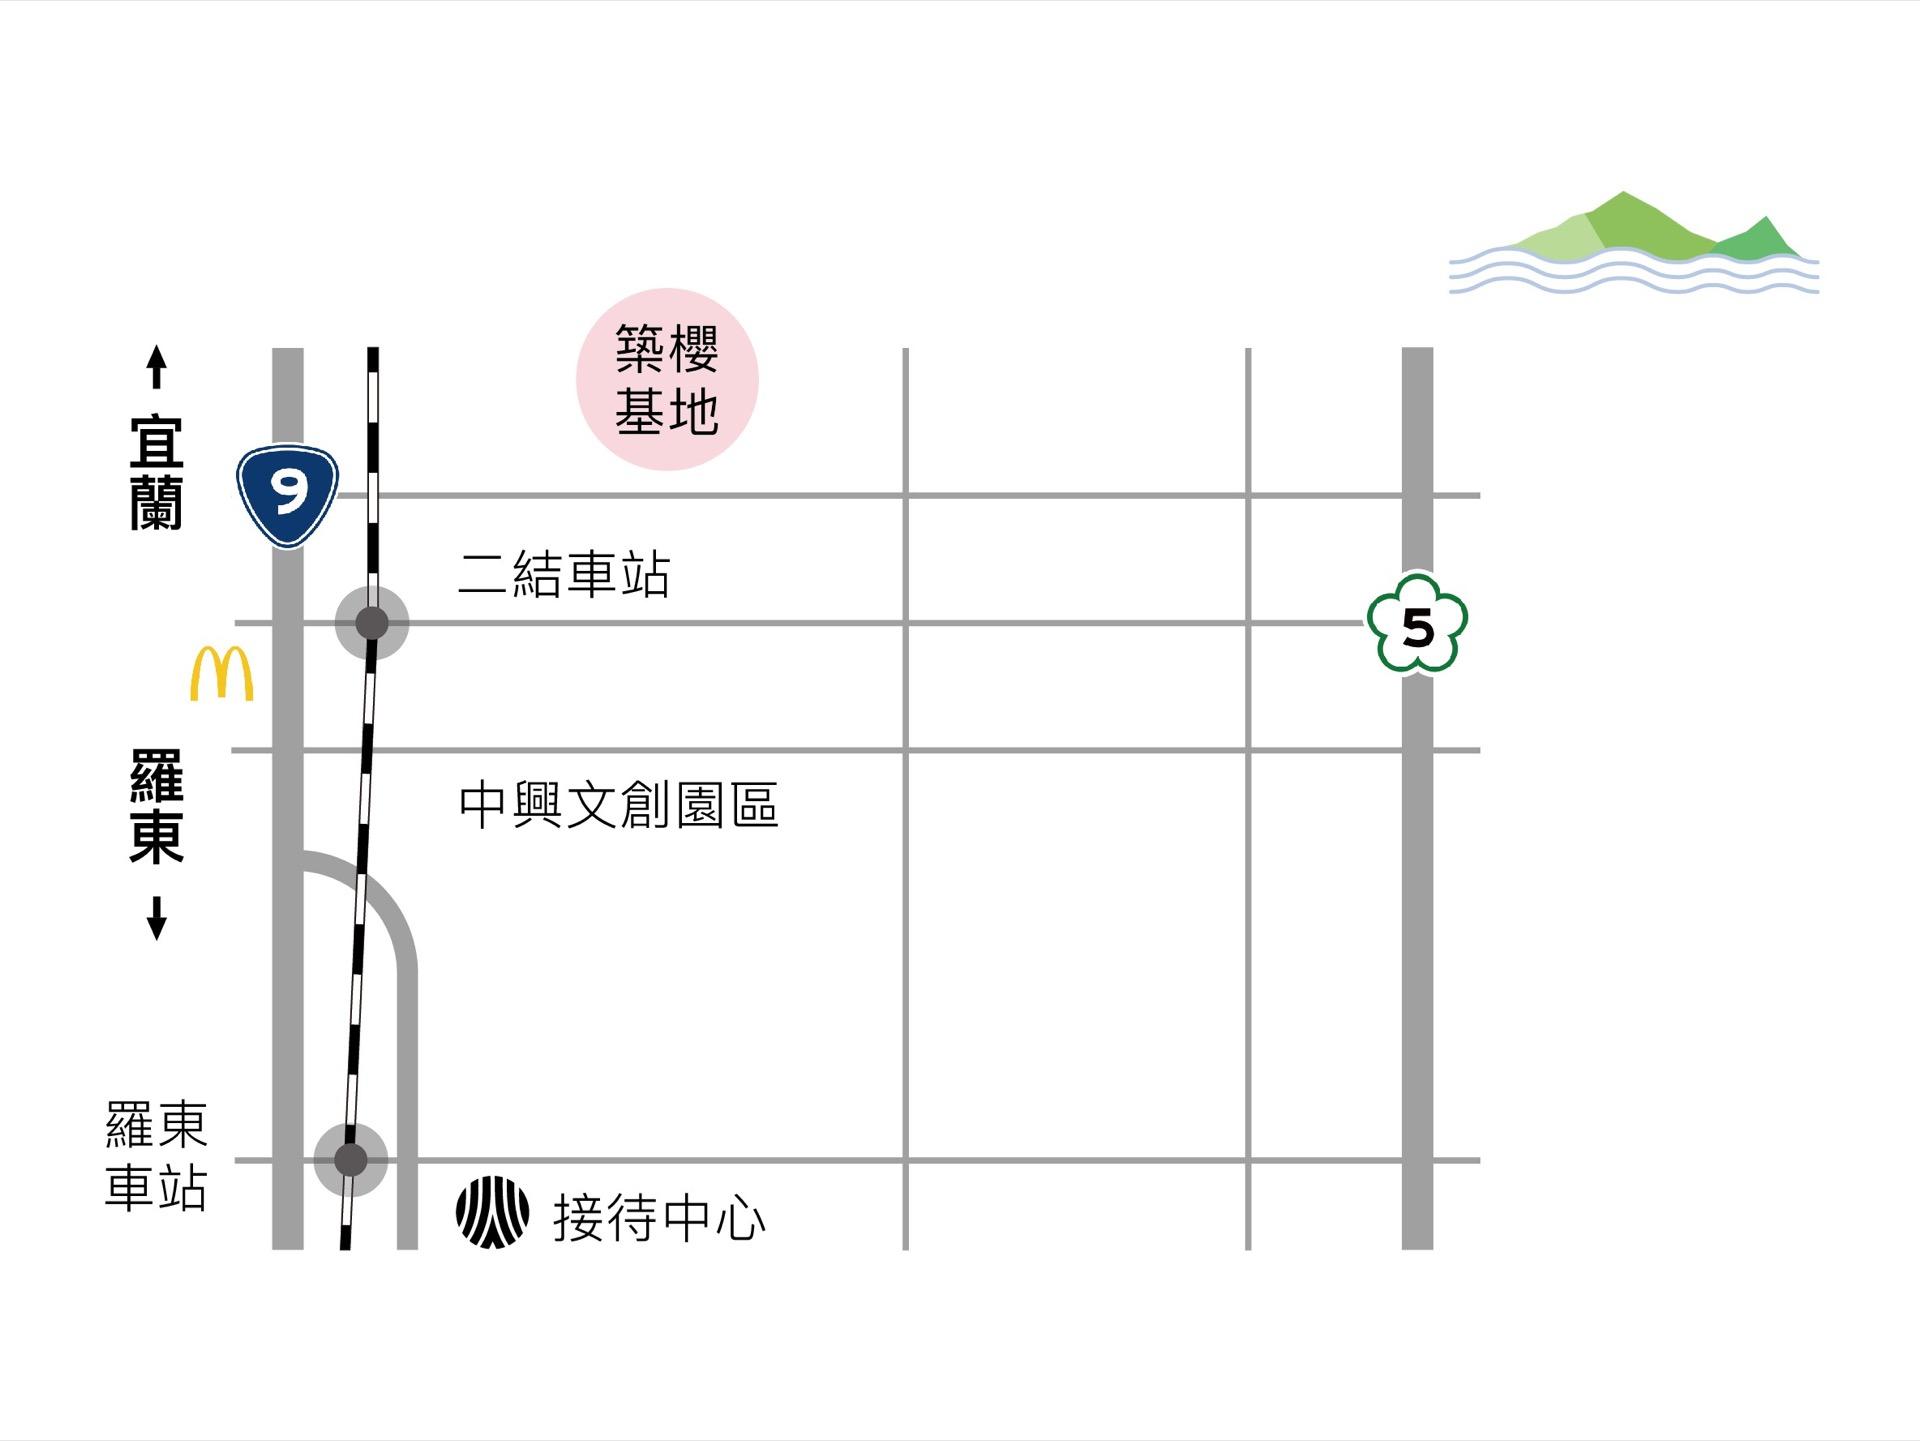 德築-DEZU-project-Zuyin-architecture-building-simple-map